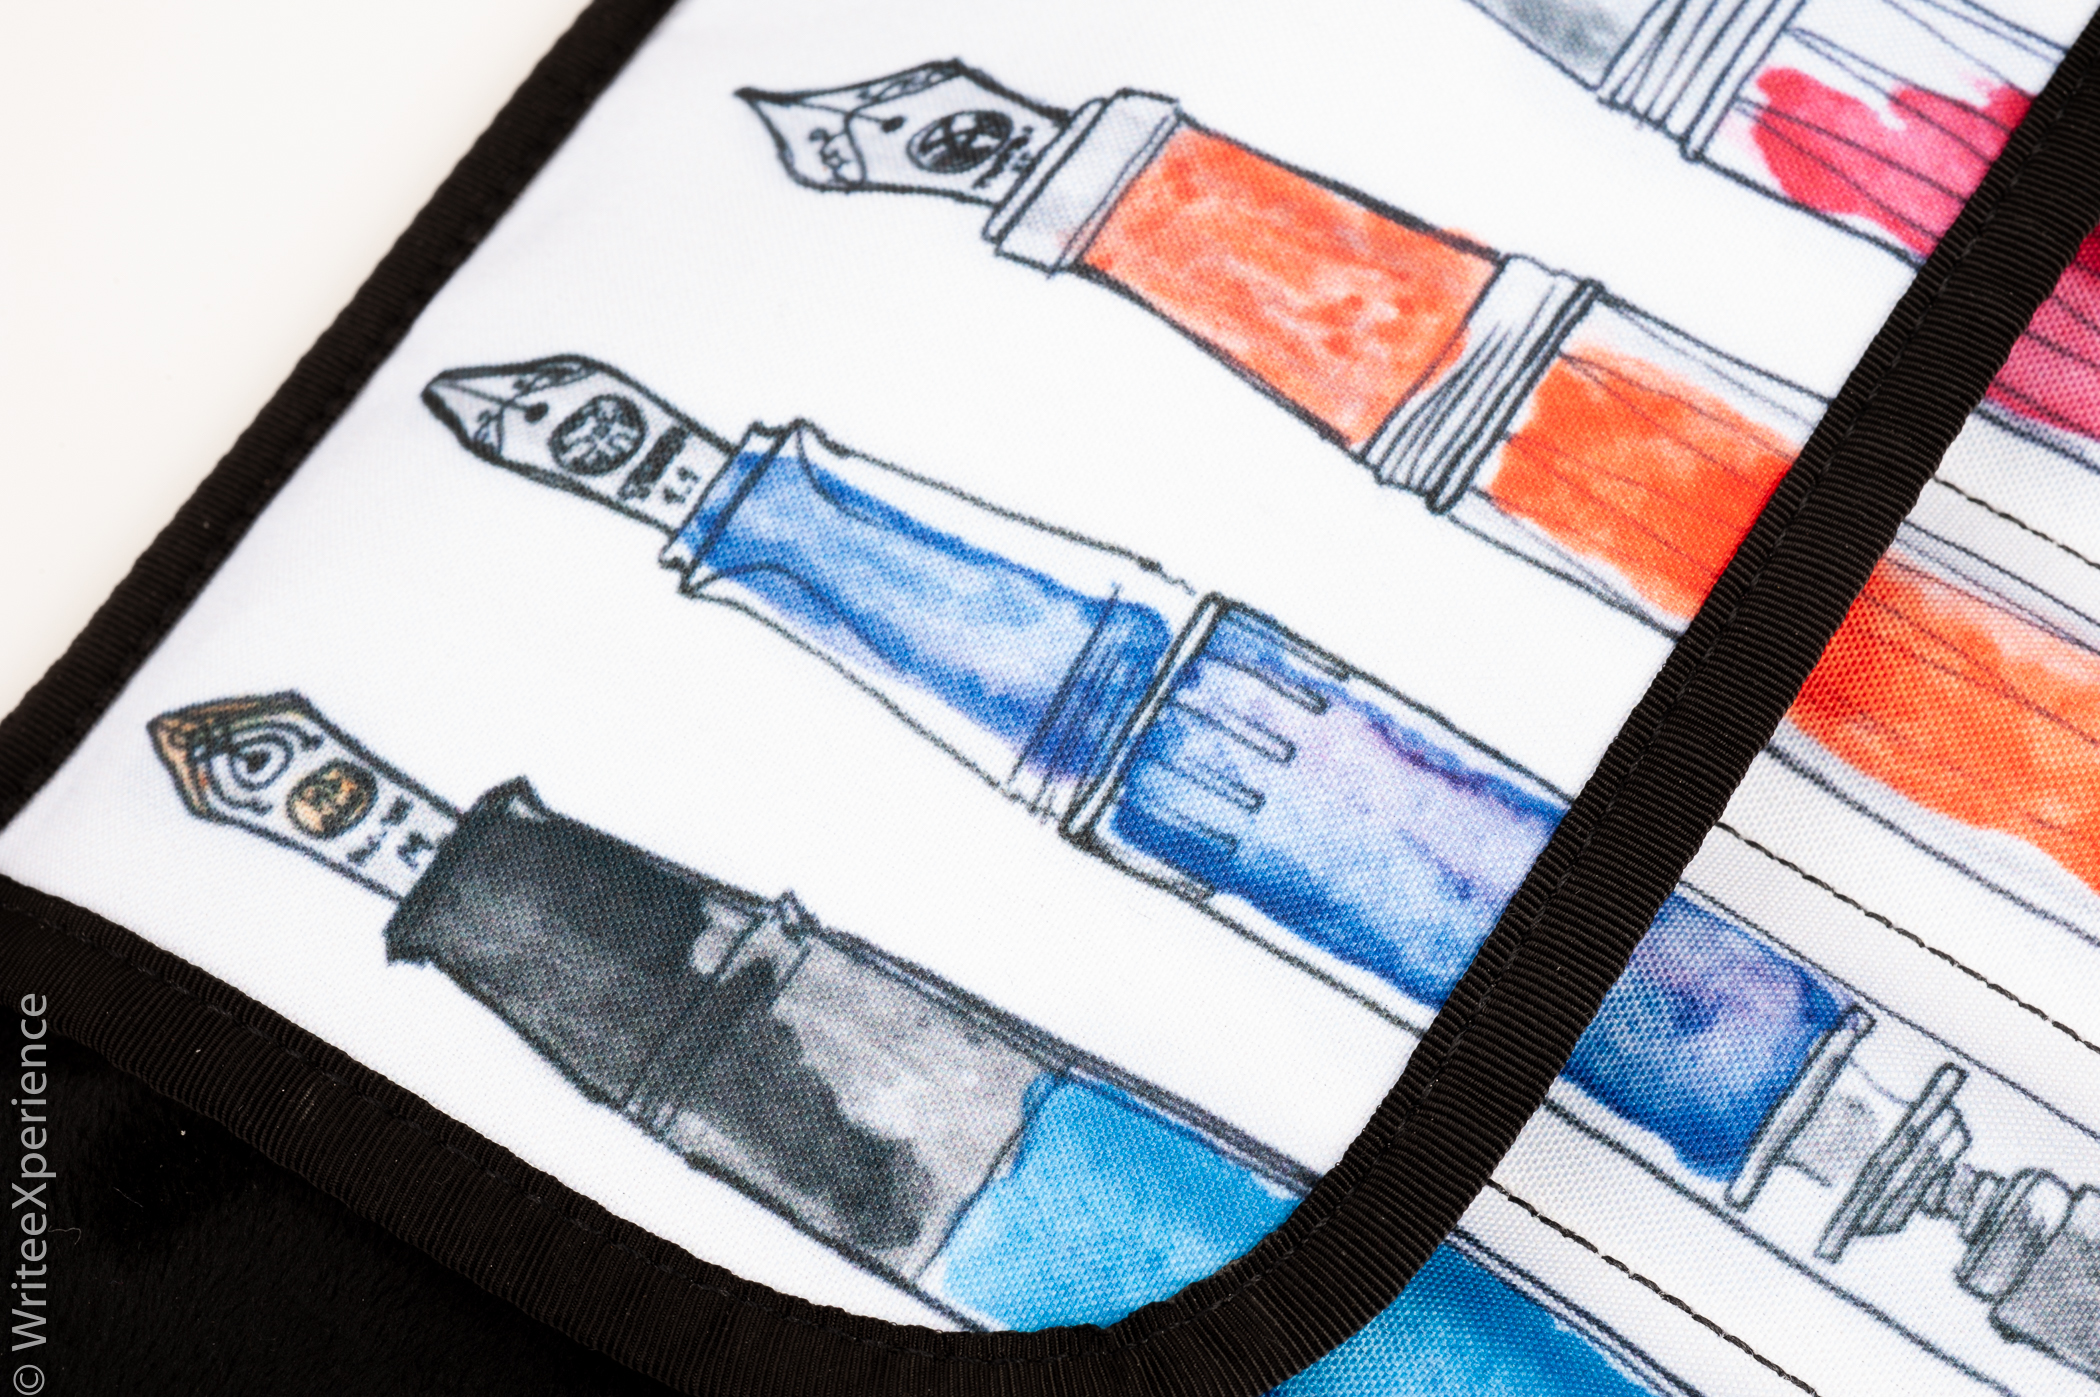 WriteeXperience-rickshaw_bags_pen_roll-6.jpg